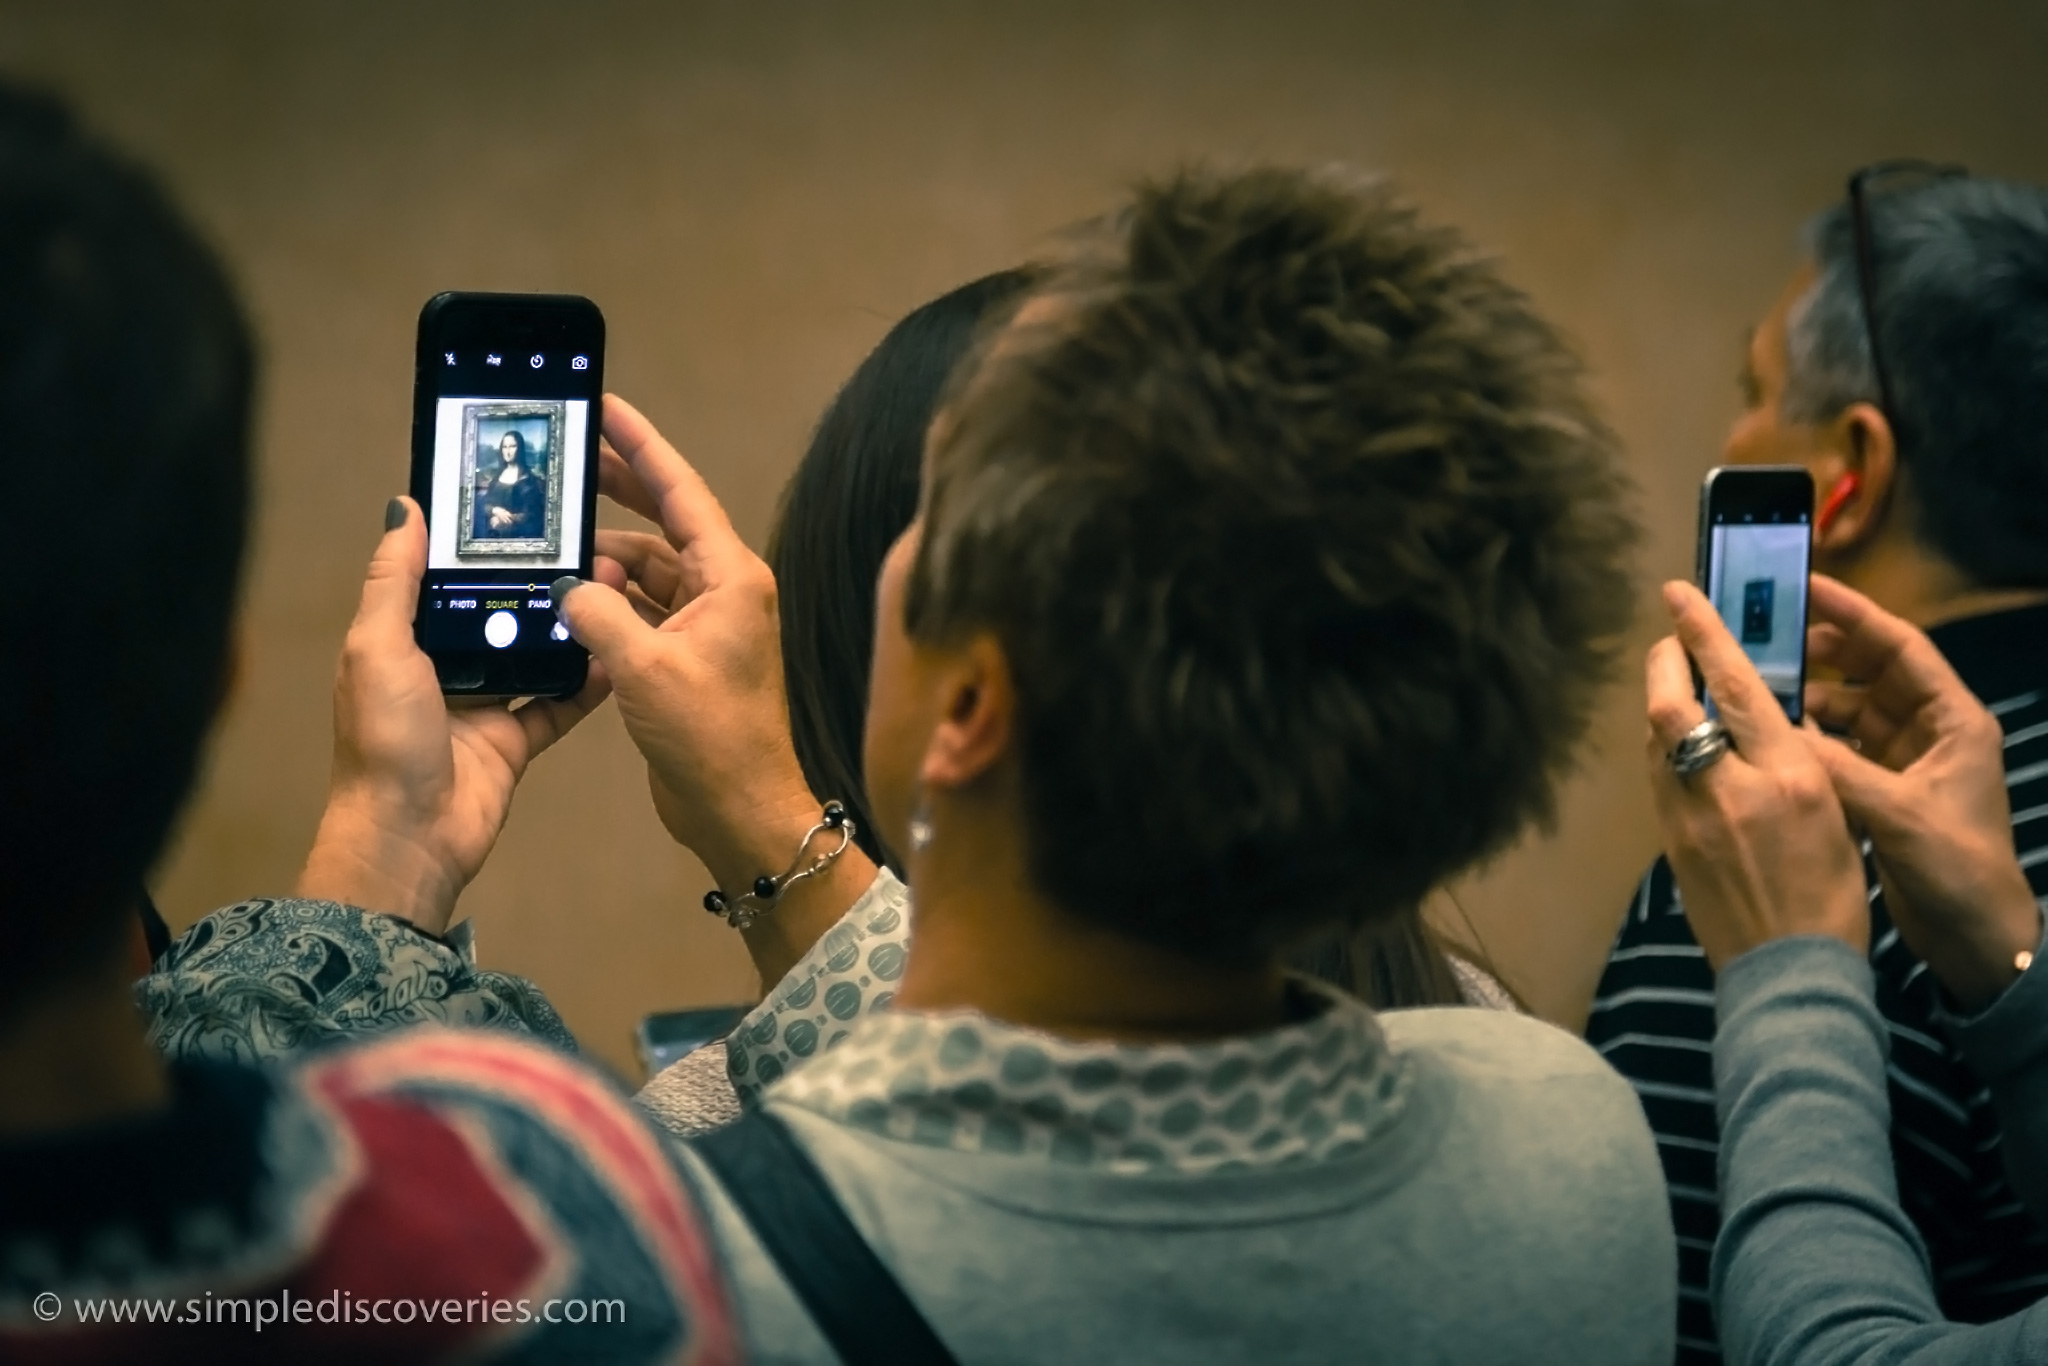 mona_lisa_cellphone_tourists